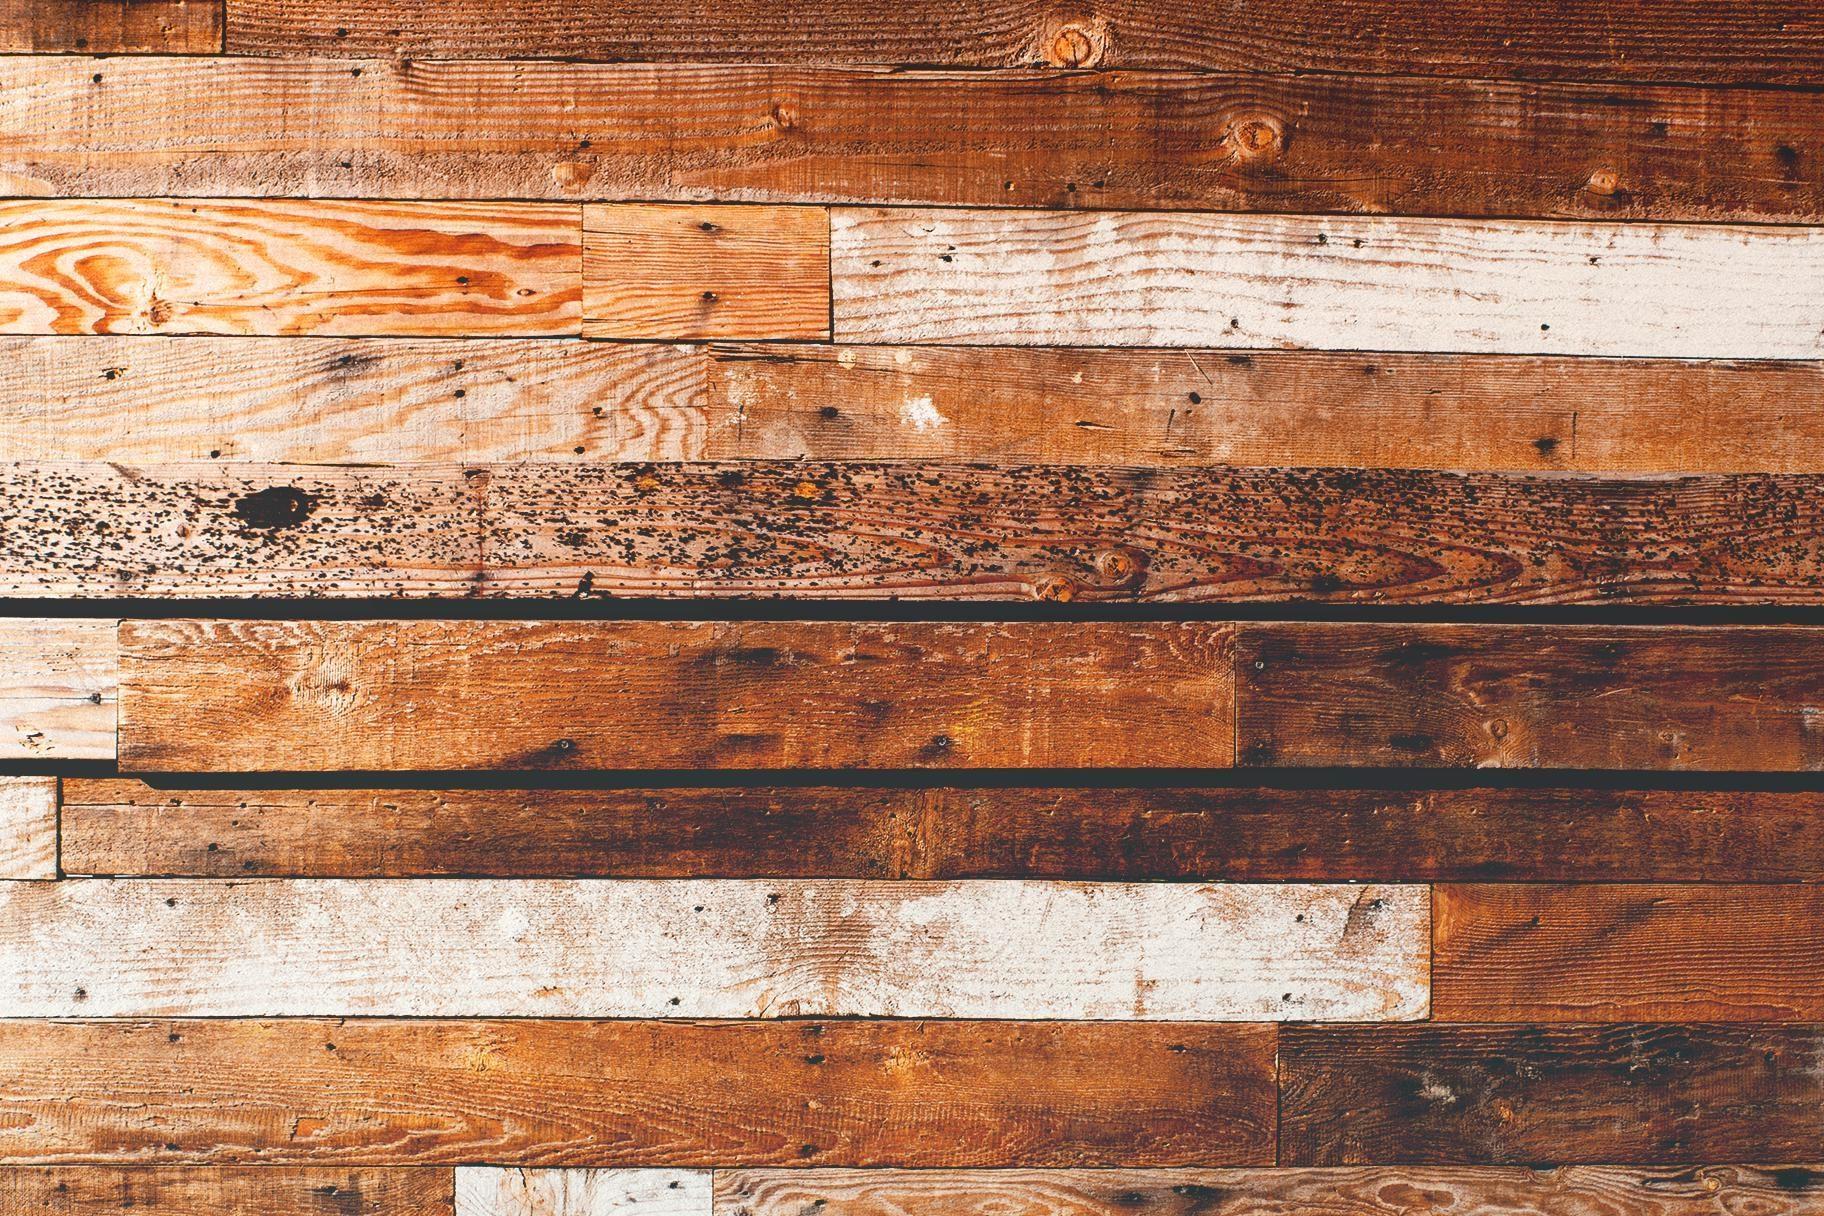 Parkettboden muster  Kostenlose Bild: Holz, Muster, Parkettboden, Struktur, Material ...